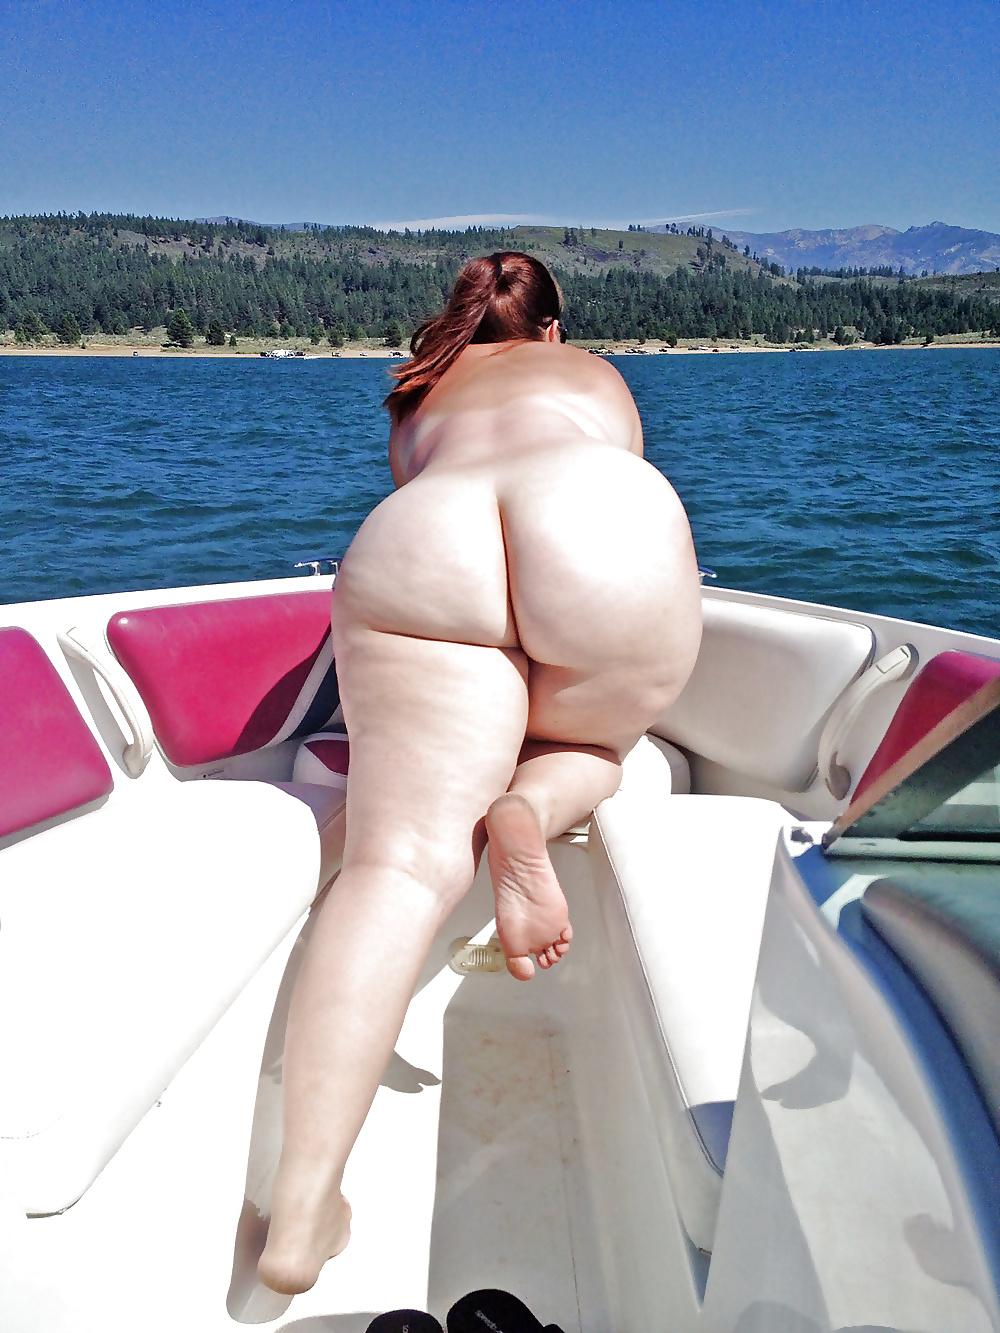 Барыня с толстой попой на отдыхе фото — pic 3